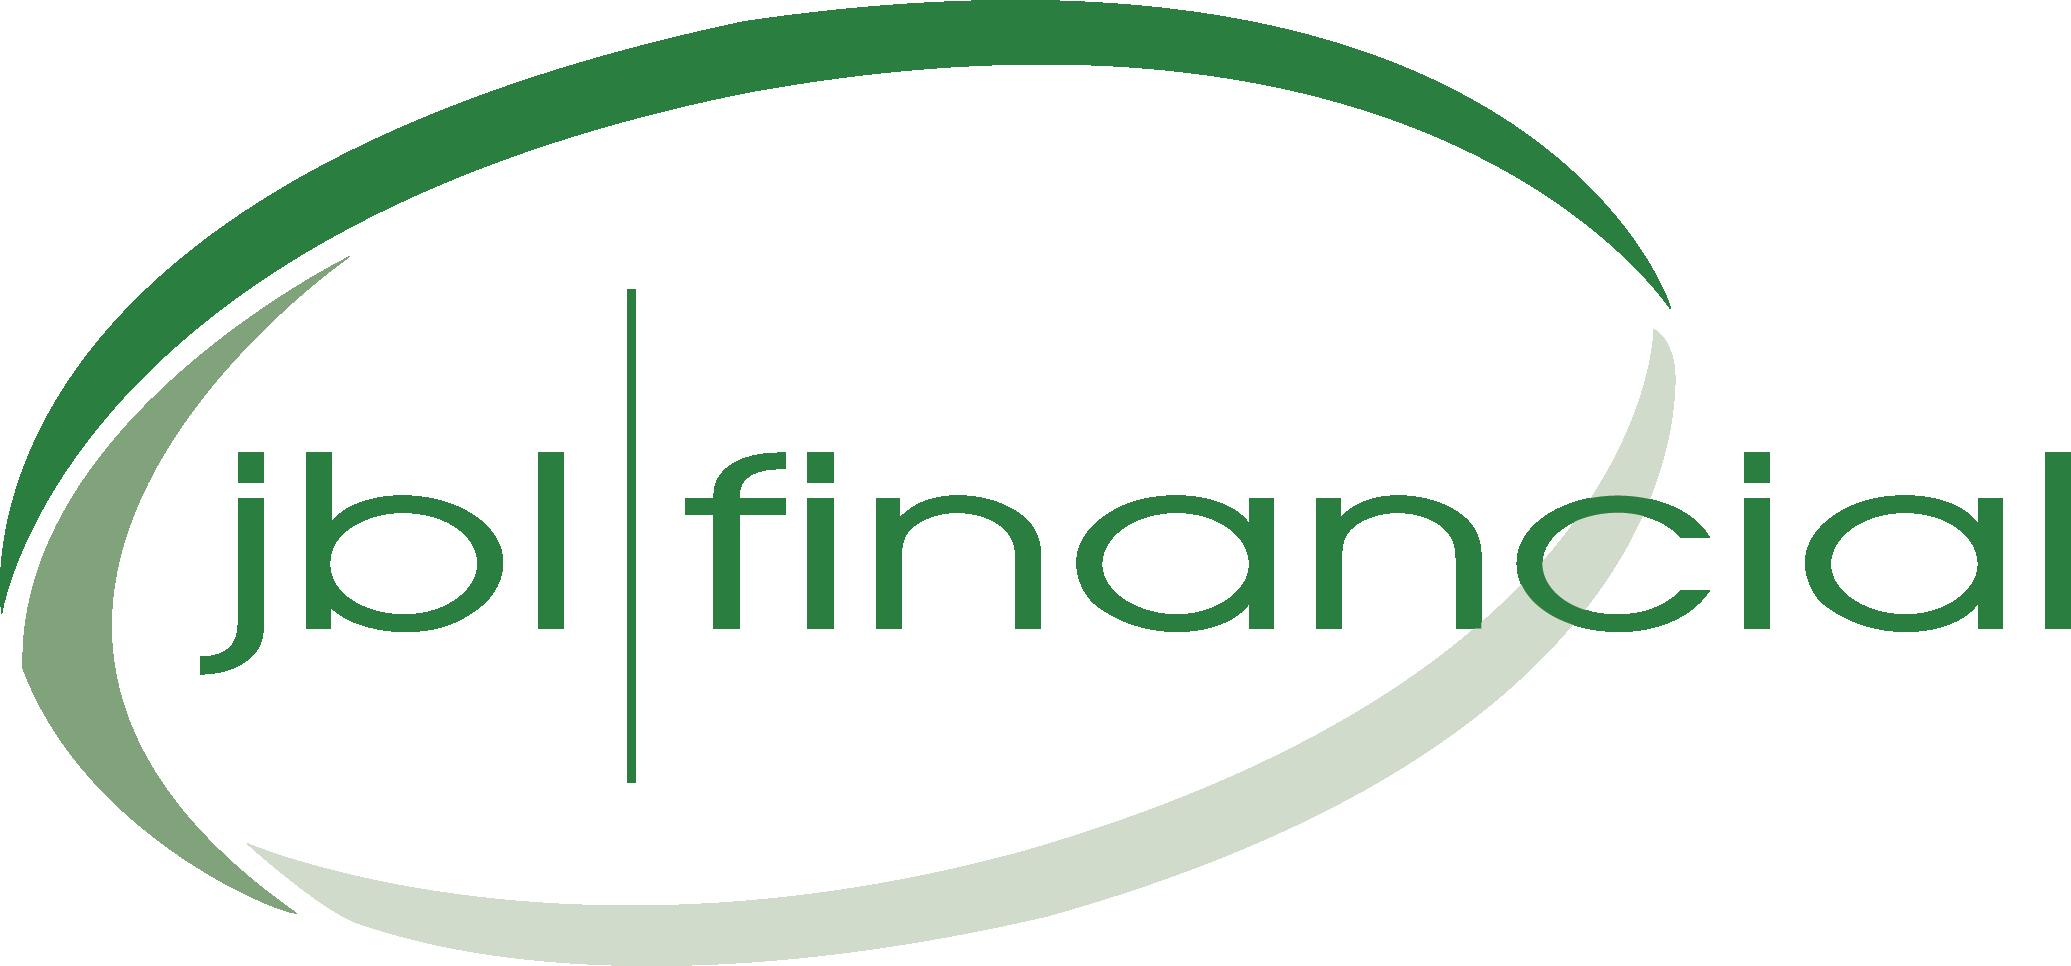 The Retirement Coaches   JBL Financial Services, Inc.